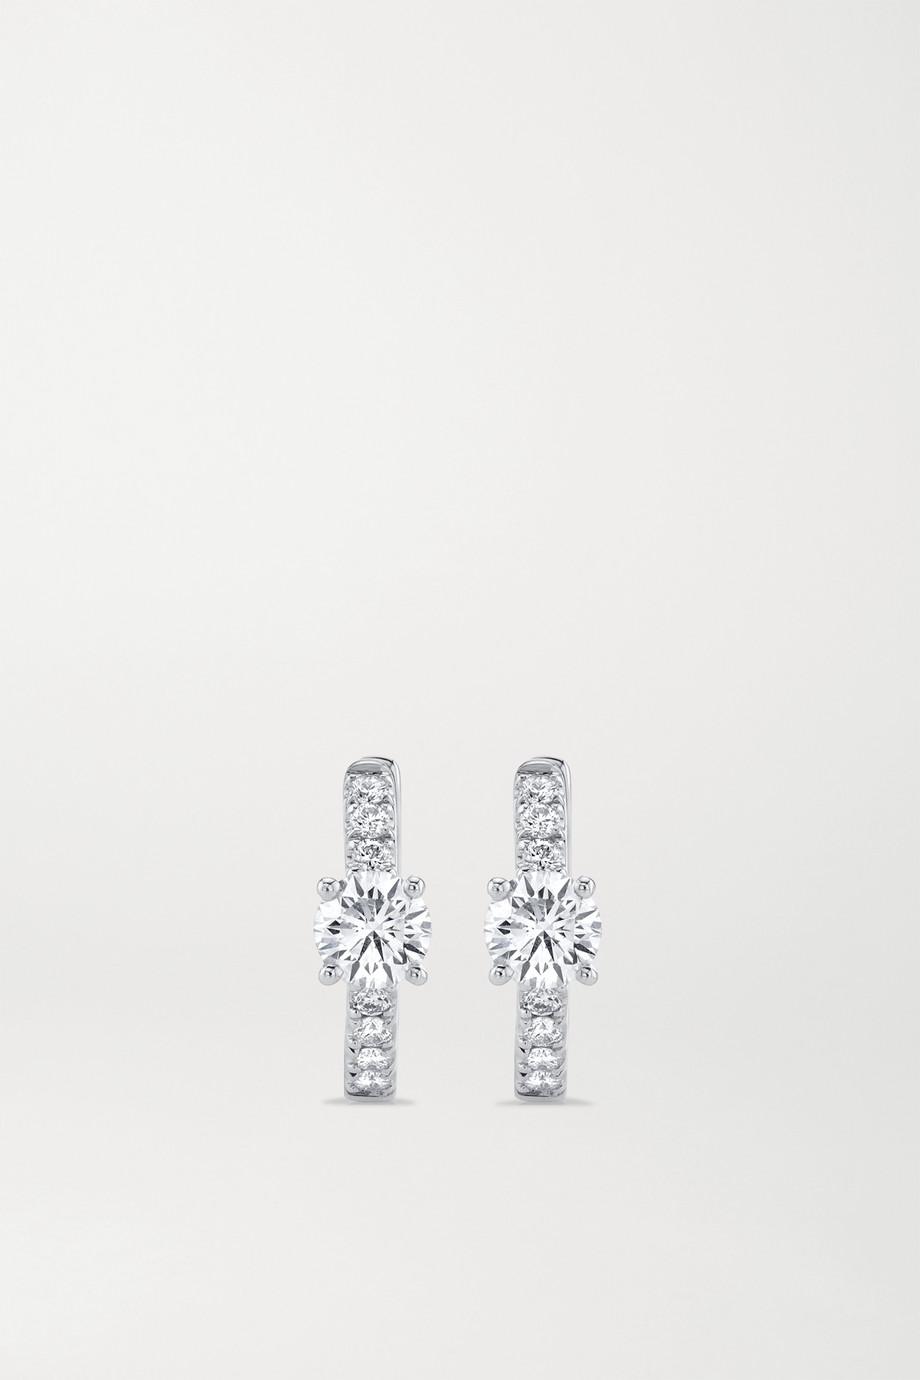 Anita Ko Huggies 18K 白金钻石耳环